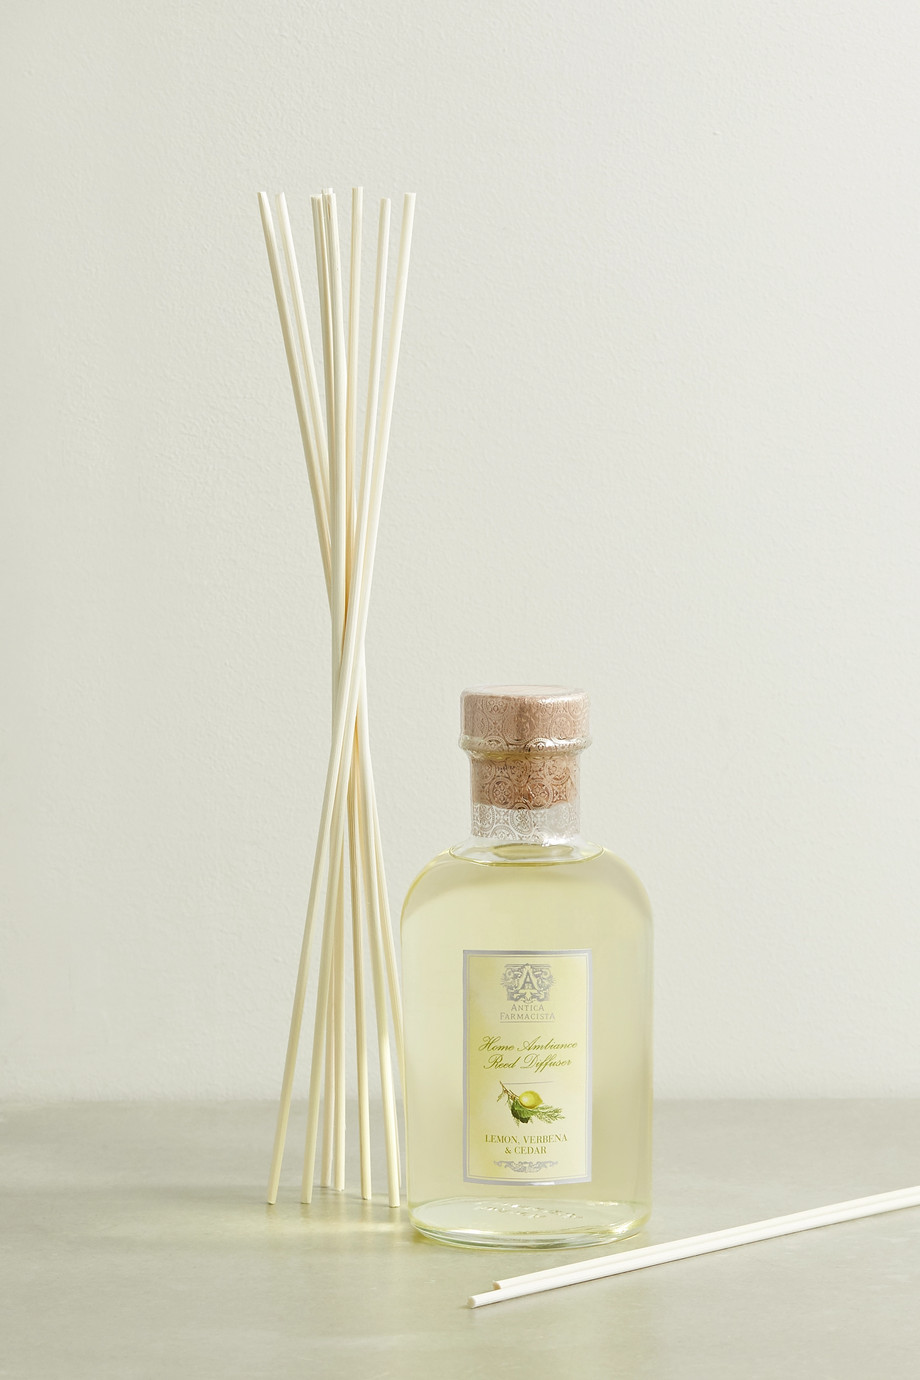 Antica Farmacista Lemon, Verbena & Cedar Reed Diffuser, 500 ml – Raumduft